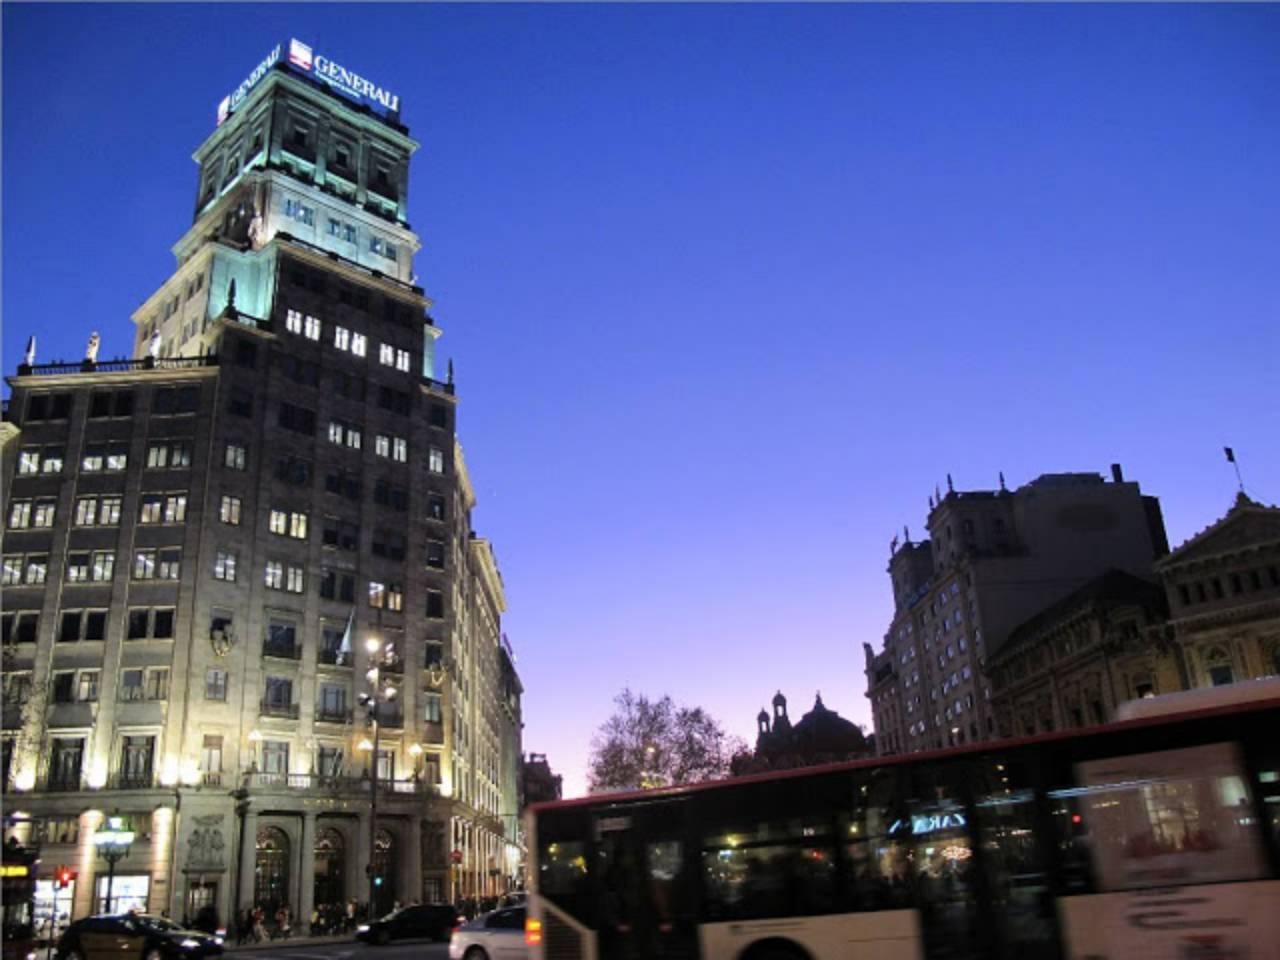 Barcelona-Centro, Edificio Vitalicio, Planta Segunda Tercera